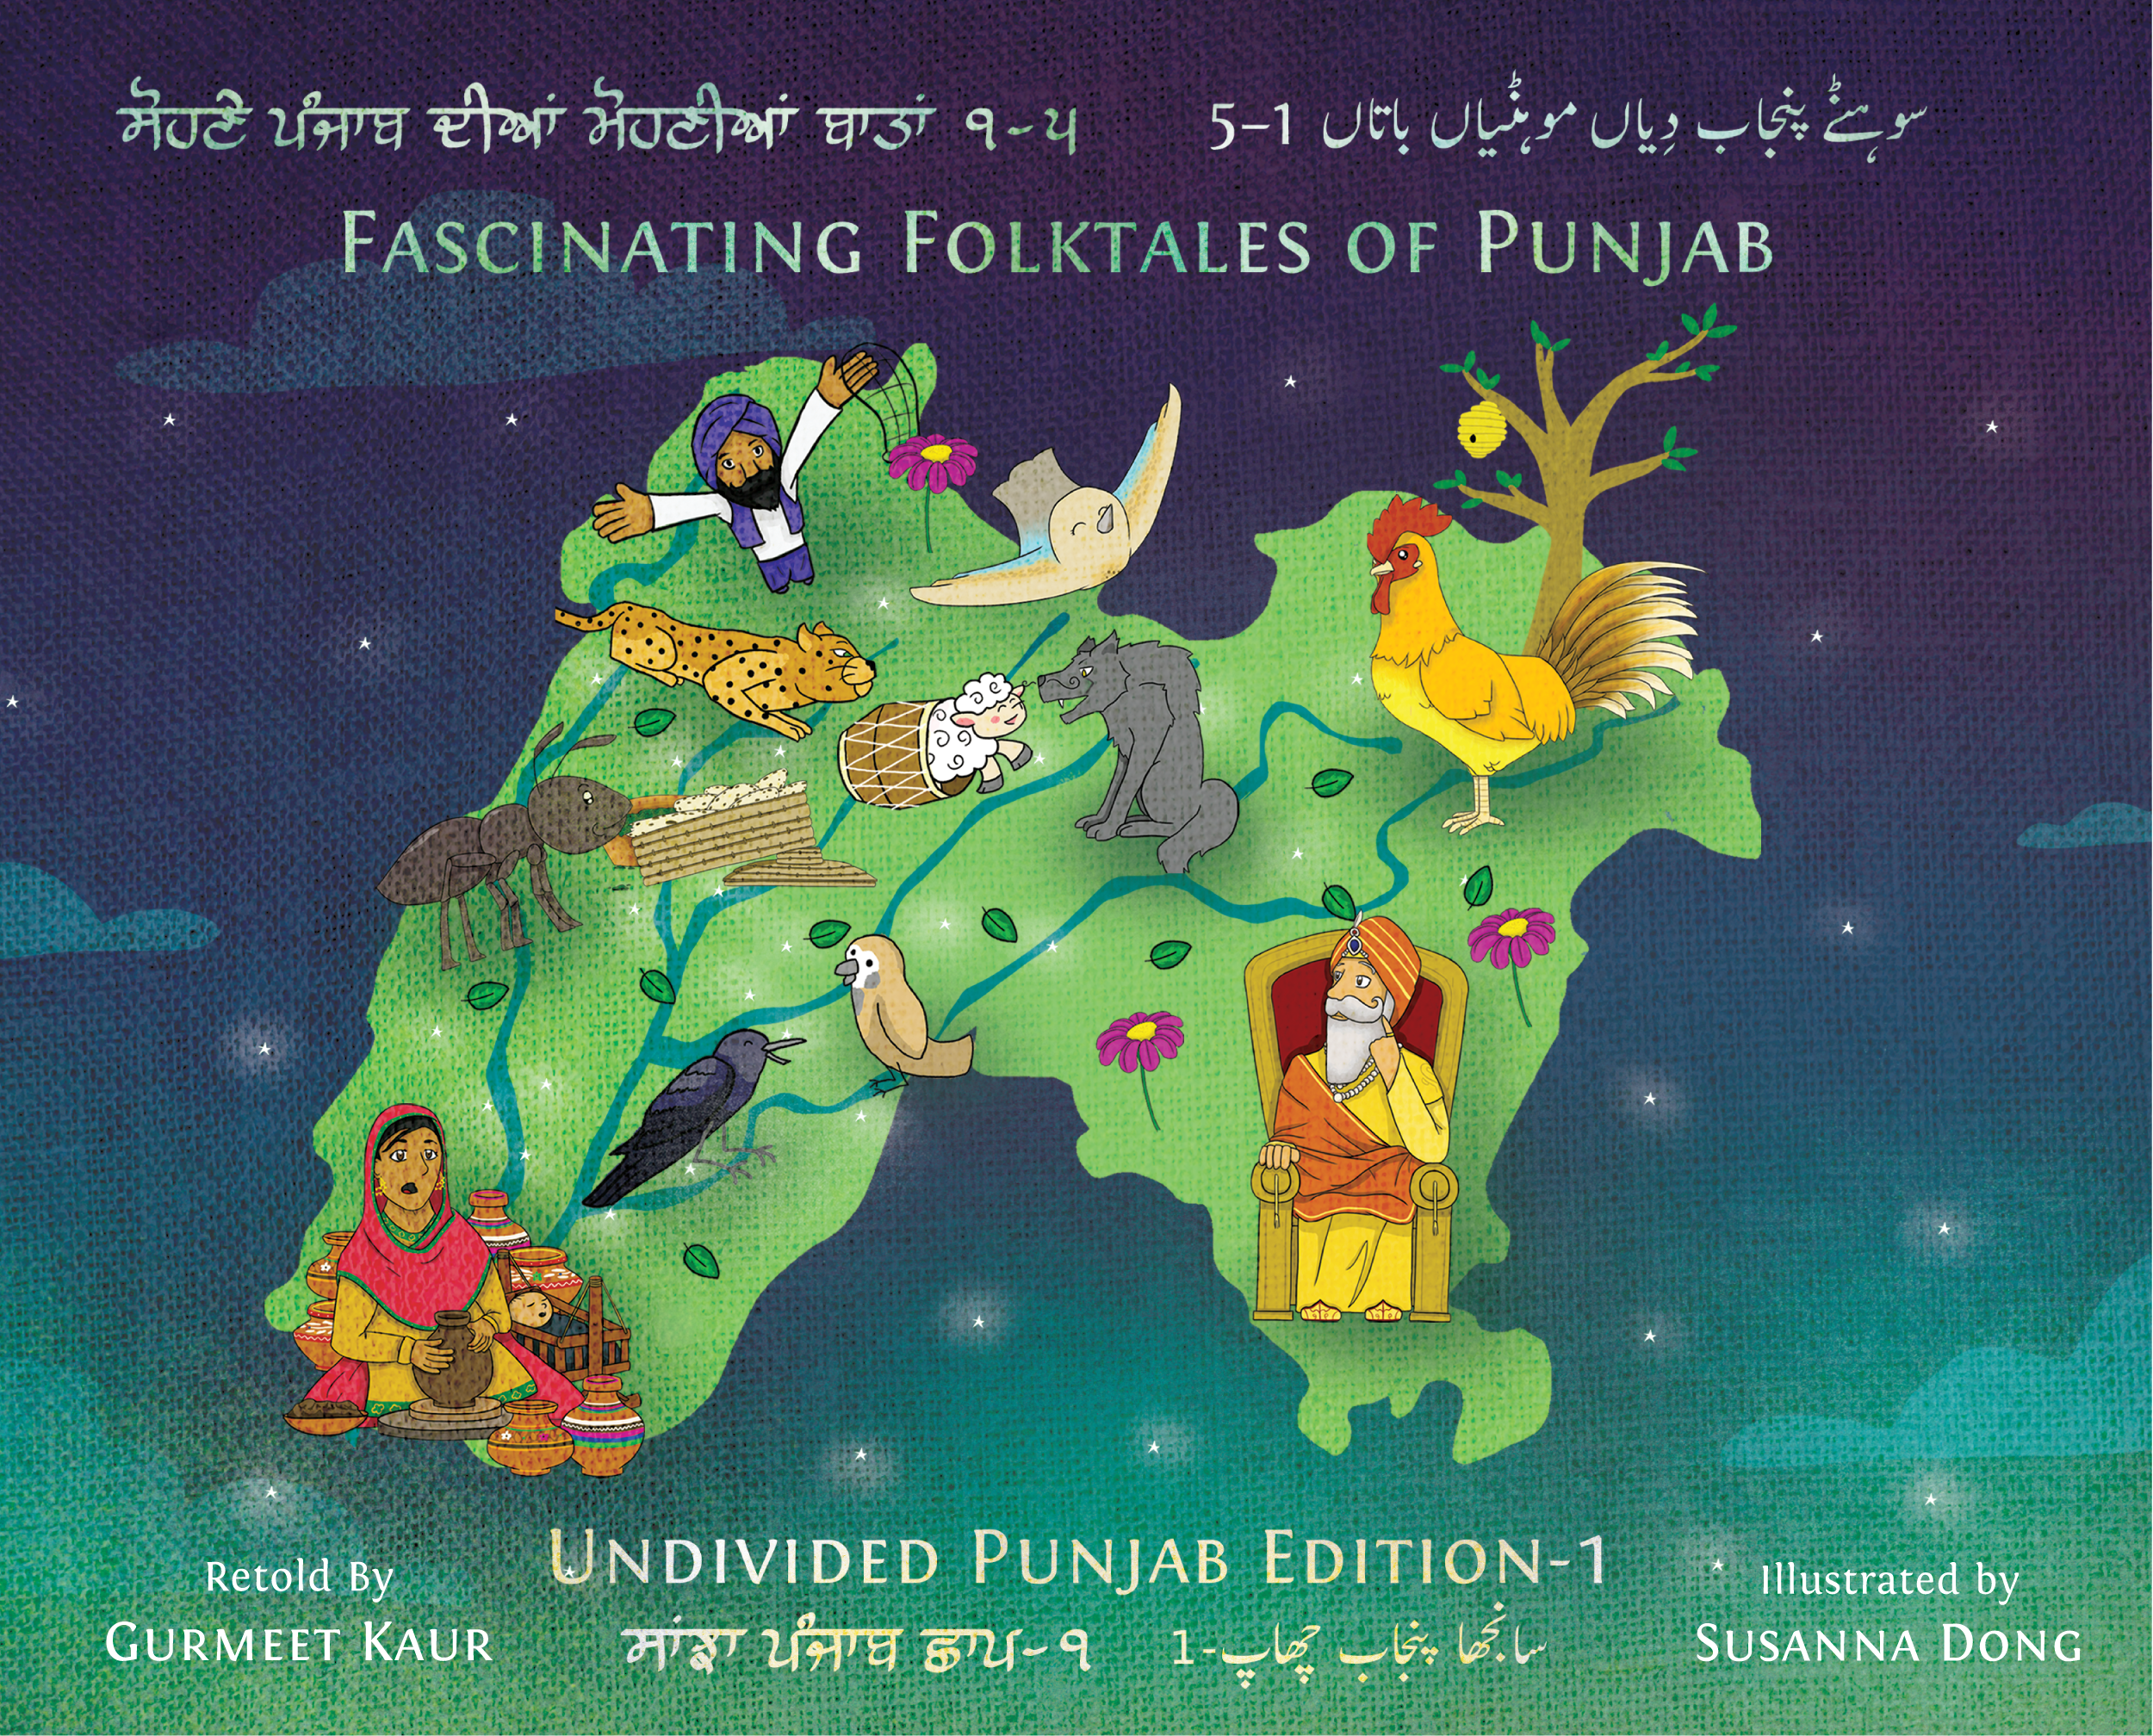 Book-Cover-Sanjha-Punjab-Edition